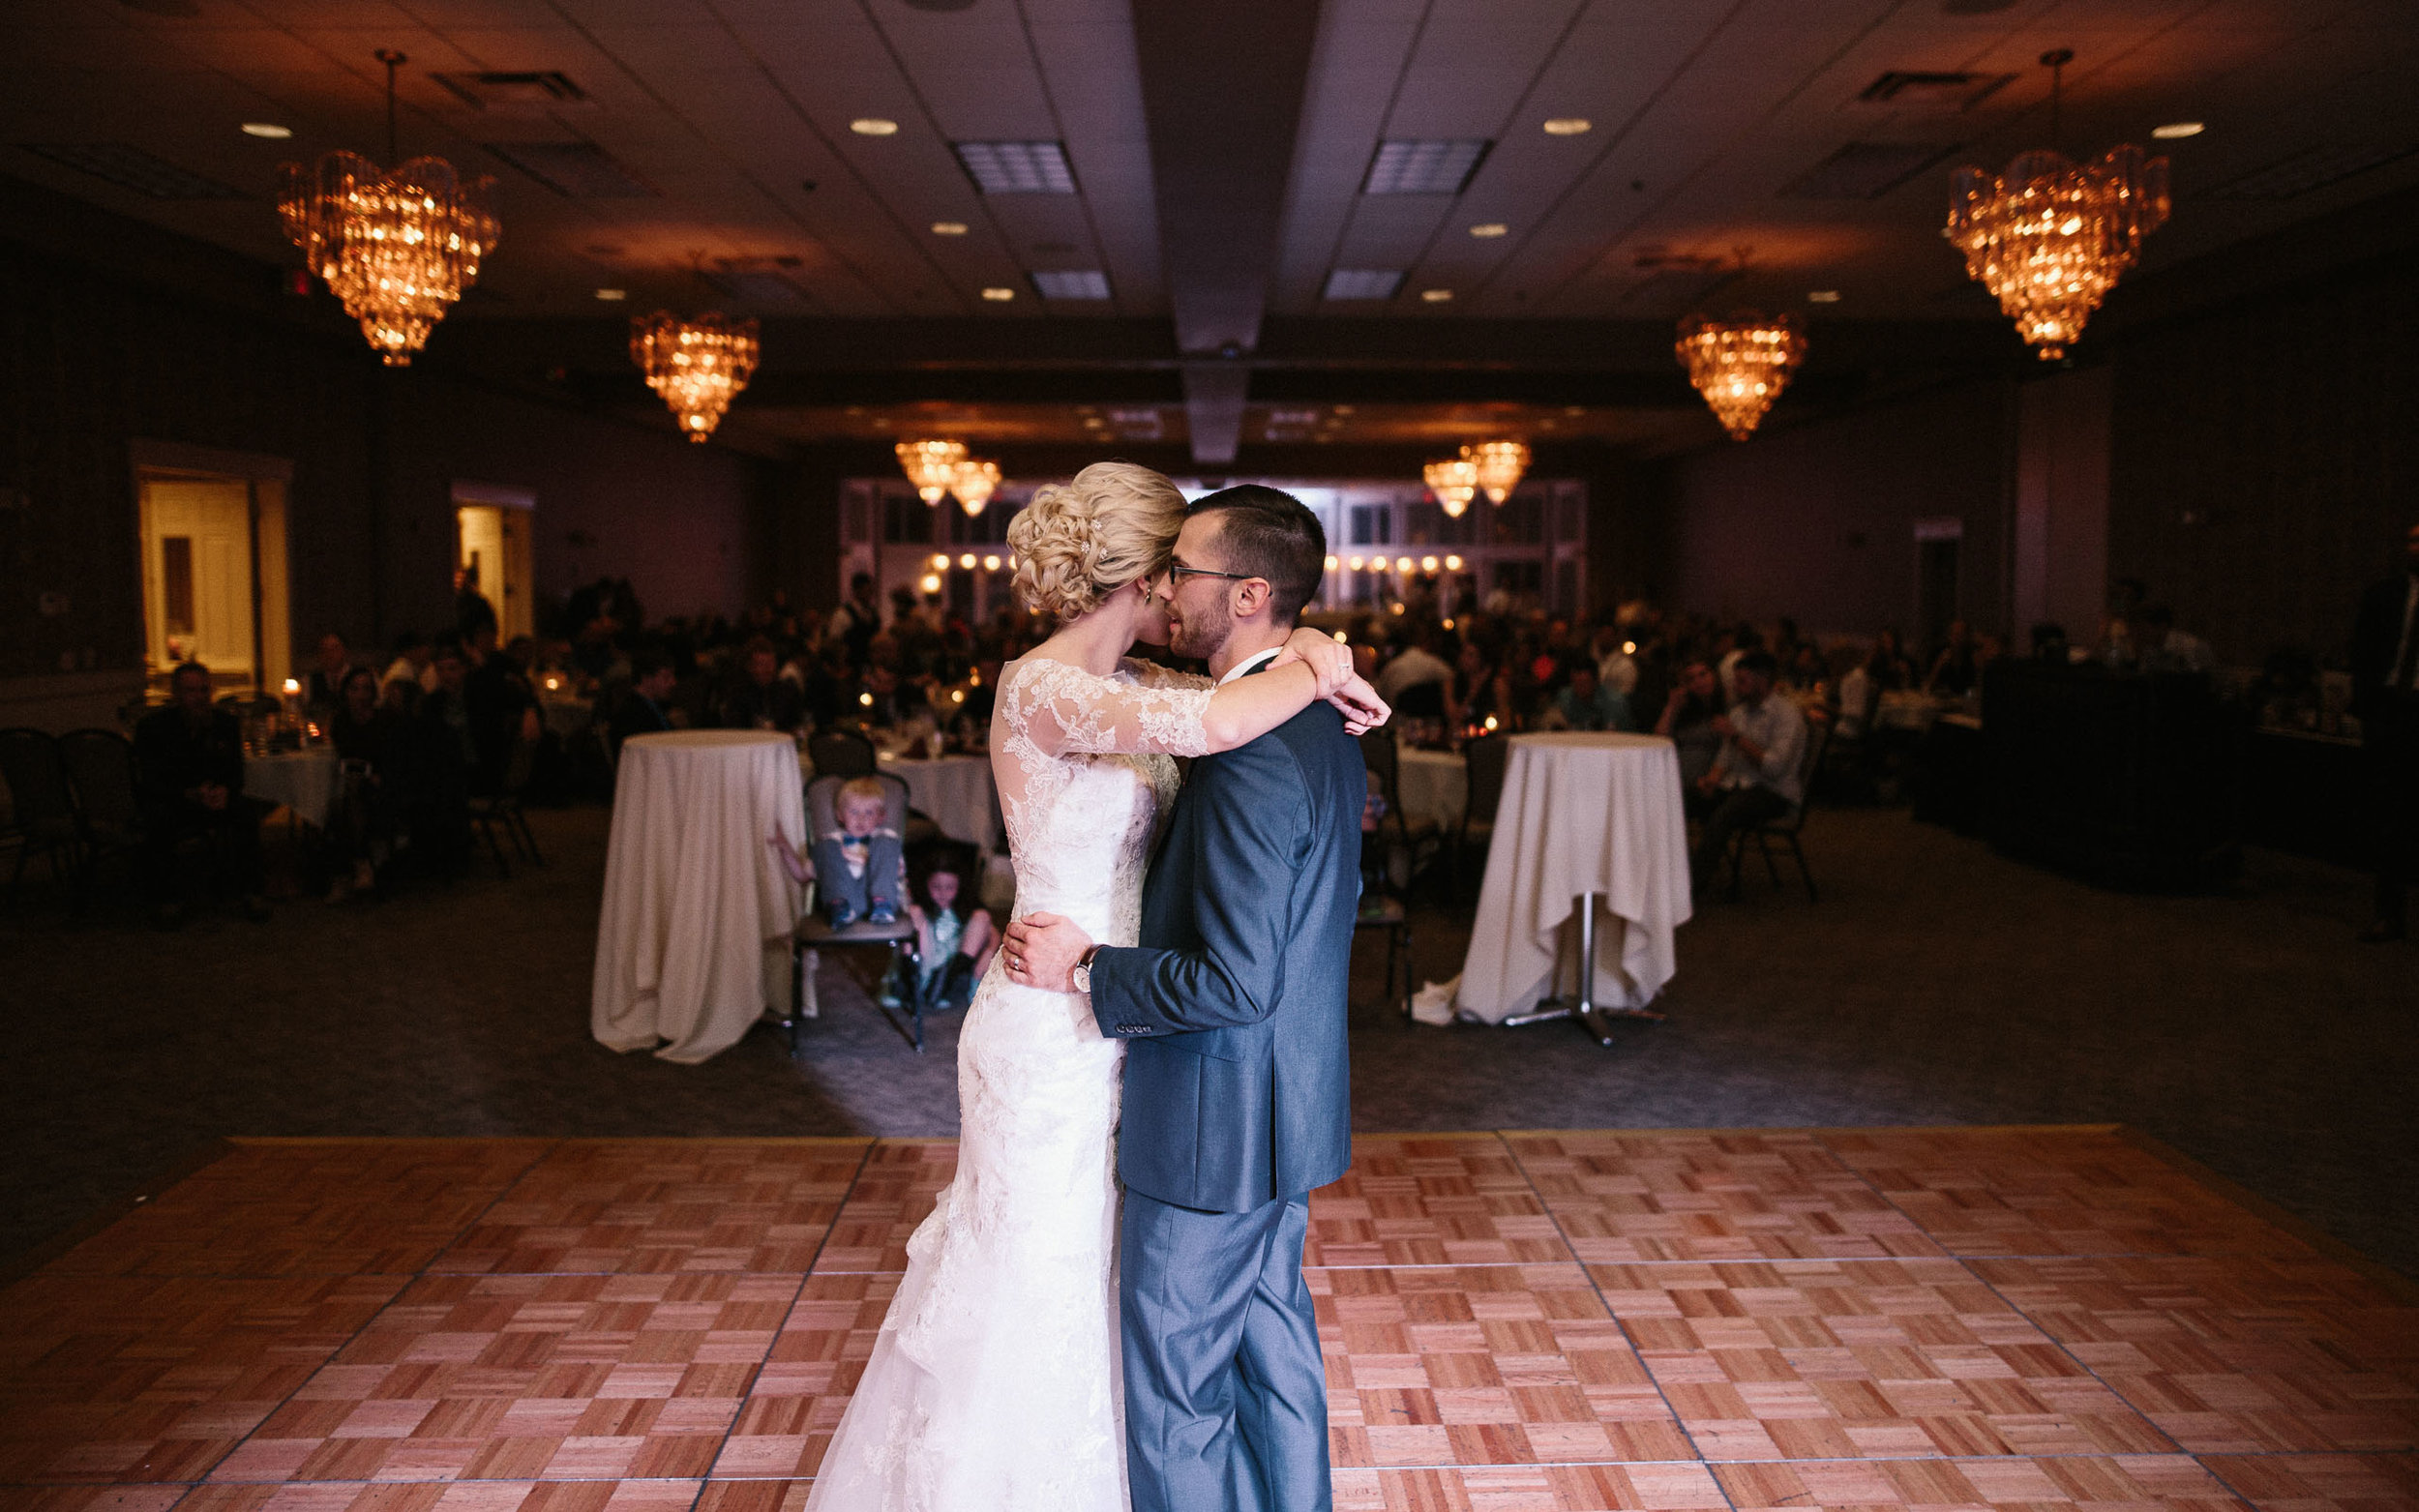 Jenna&Austin_SiouxFalls_Wedding_Photographer_105.jpg